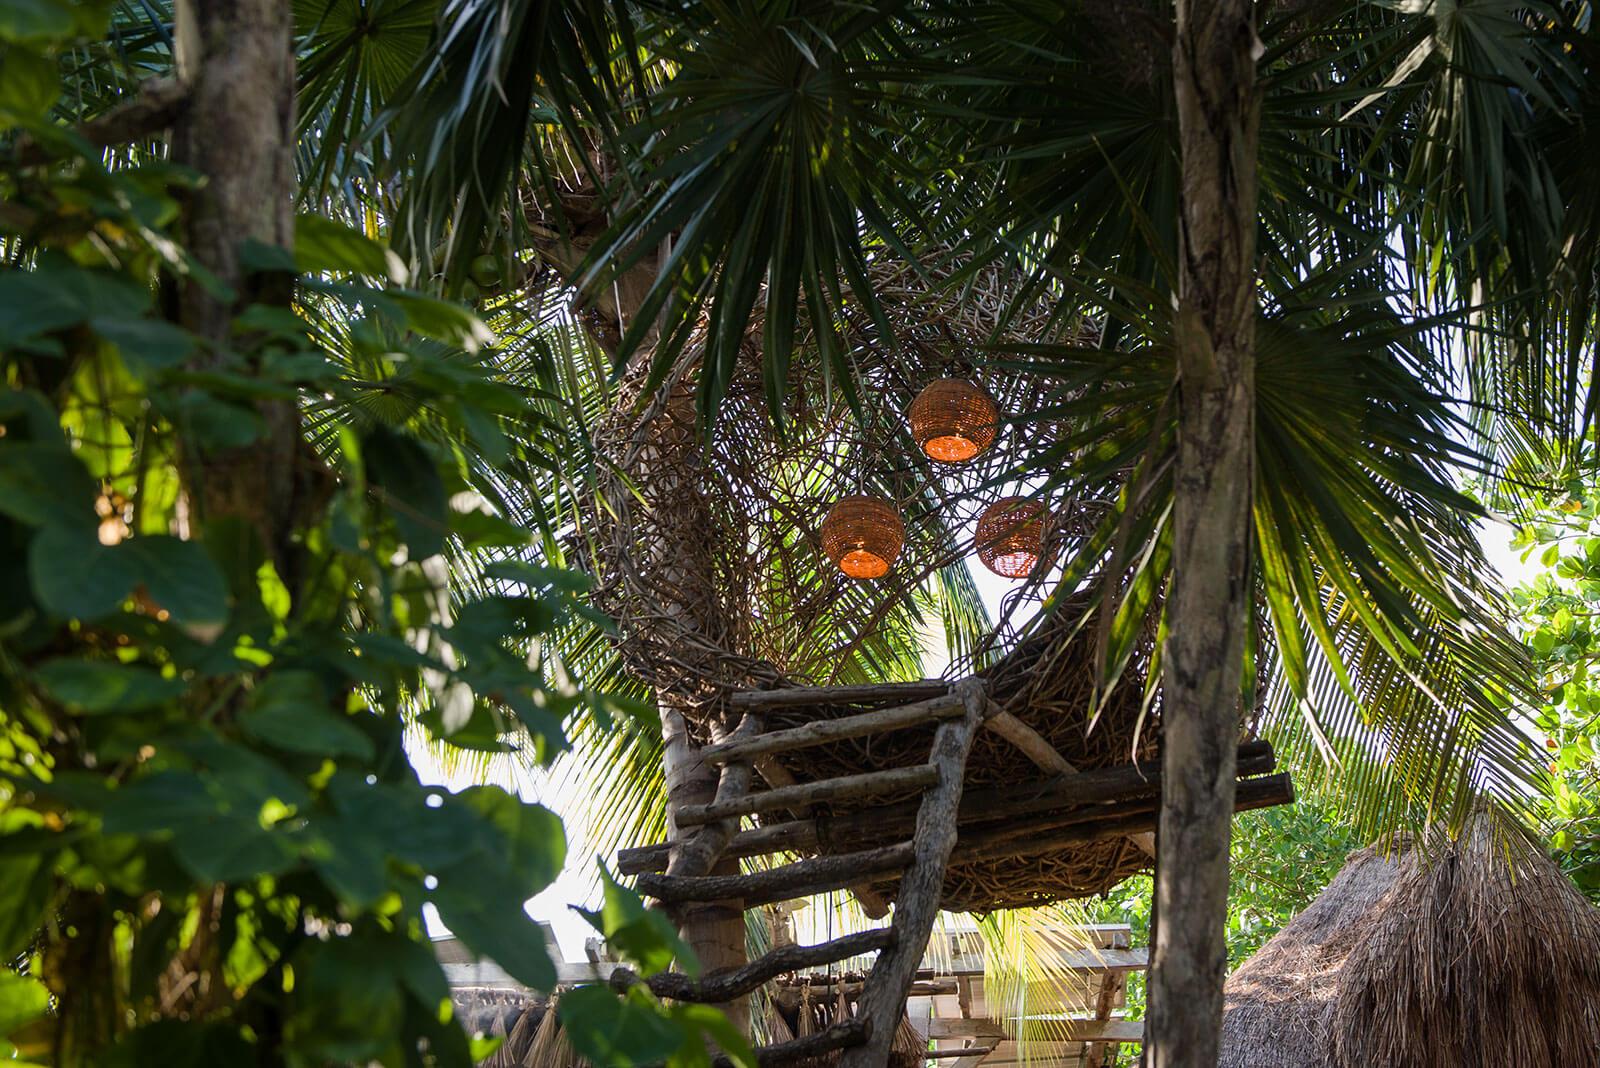 Maya_Luxe_Riviera_Maya_Luxury_Vacations_Villa_Rentals_Tulum_Playa_del_Carmen_Mexico_Bejuco_House_25.jpg